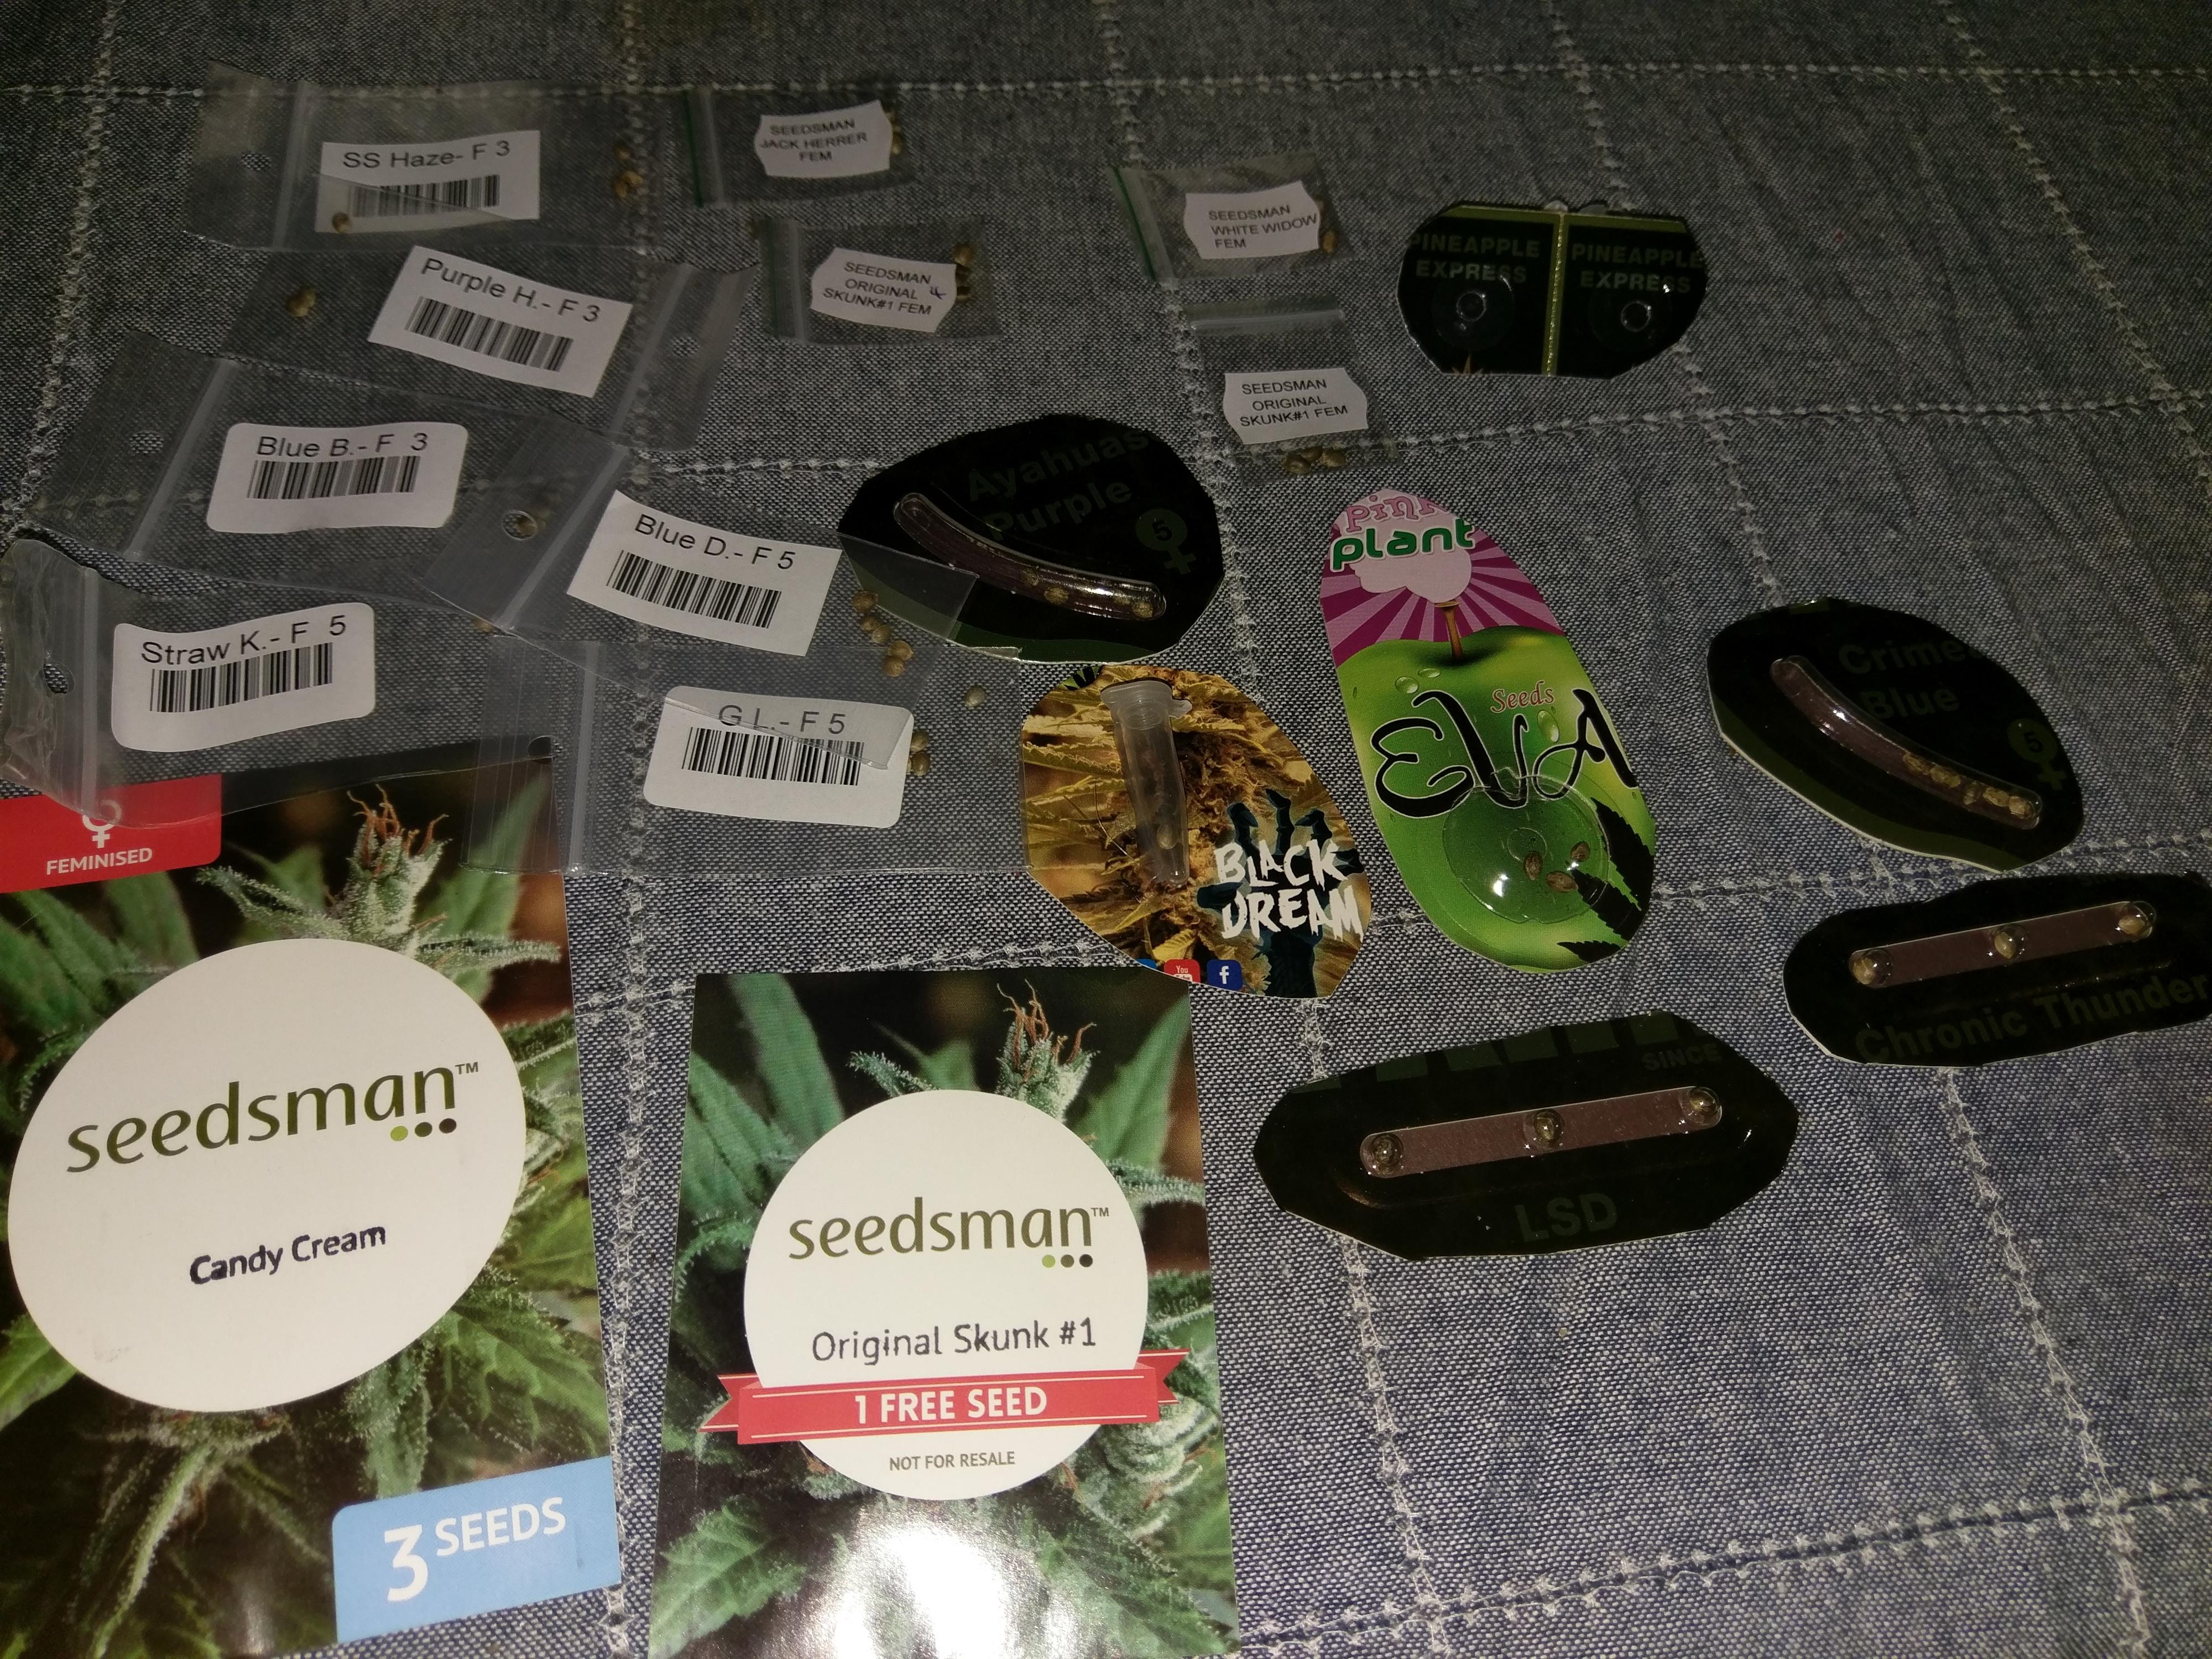 seedsman shipping